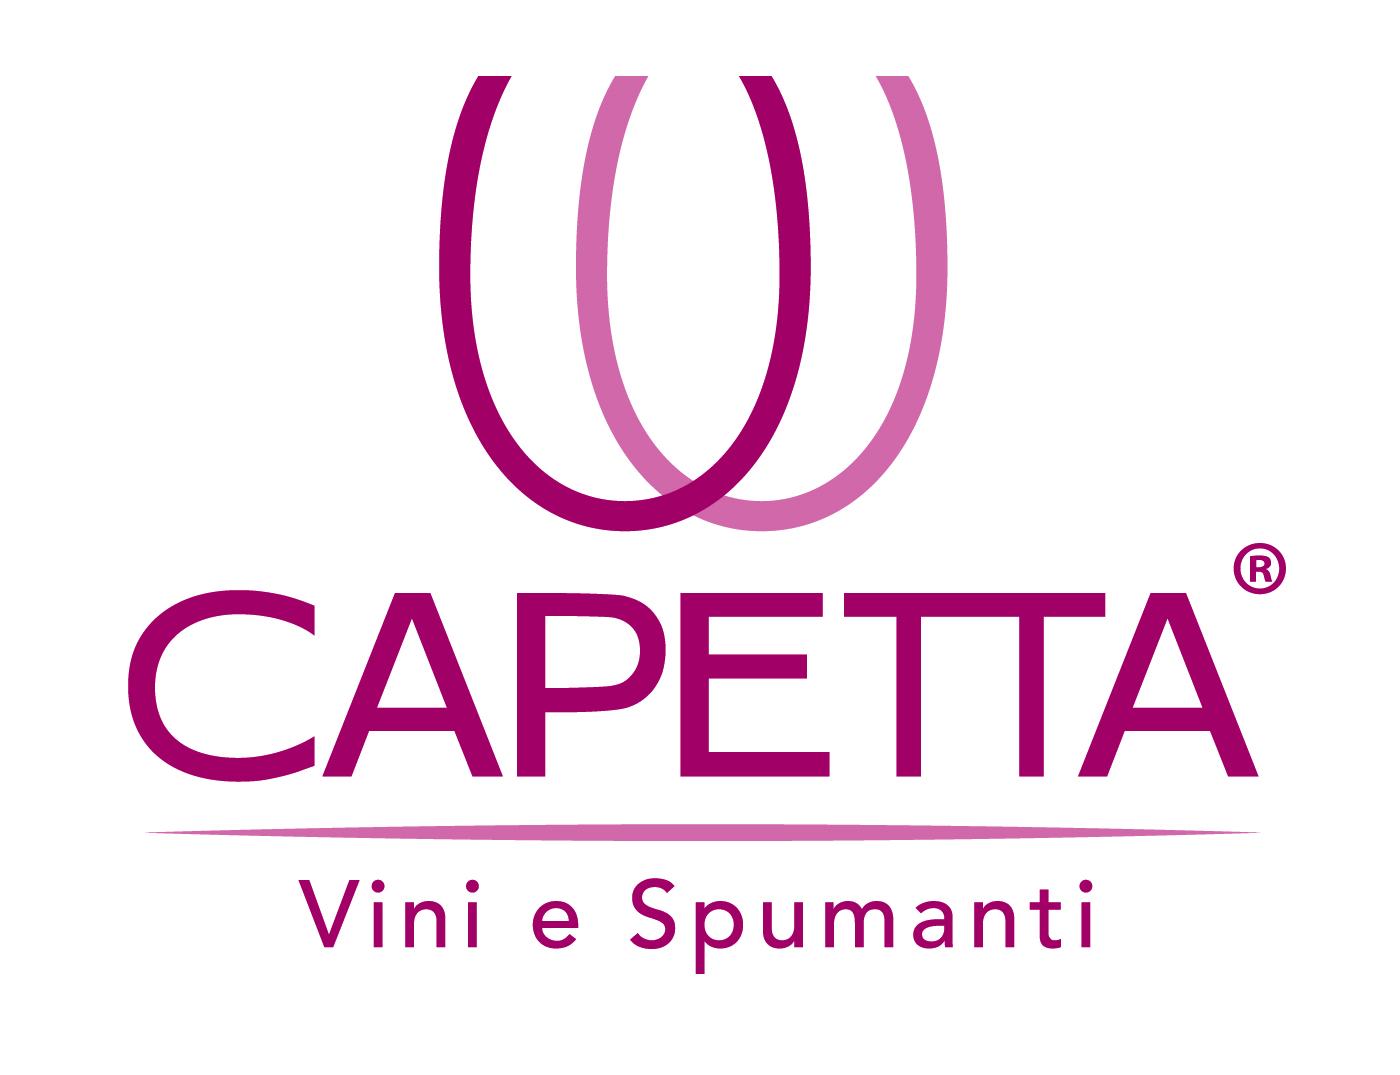 Capetta vini